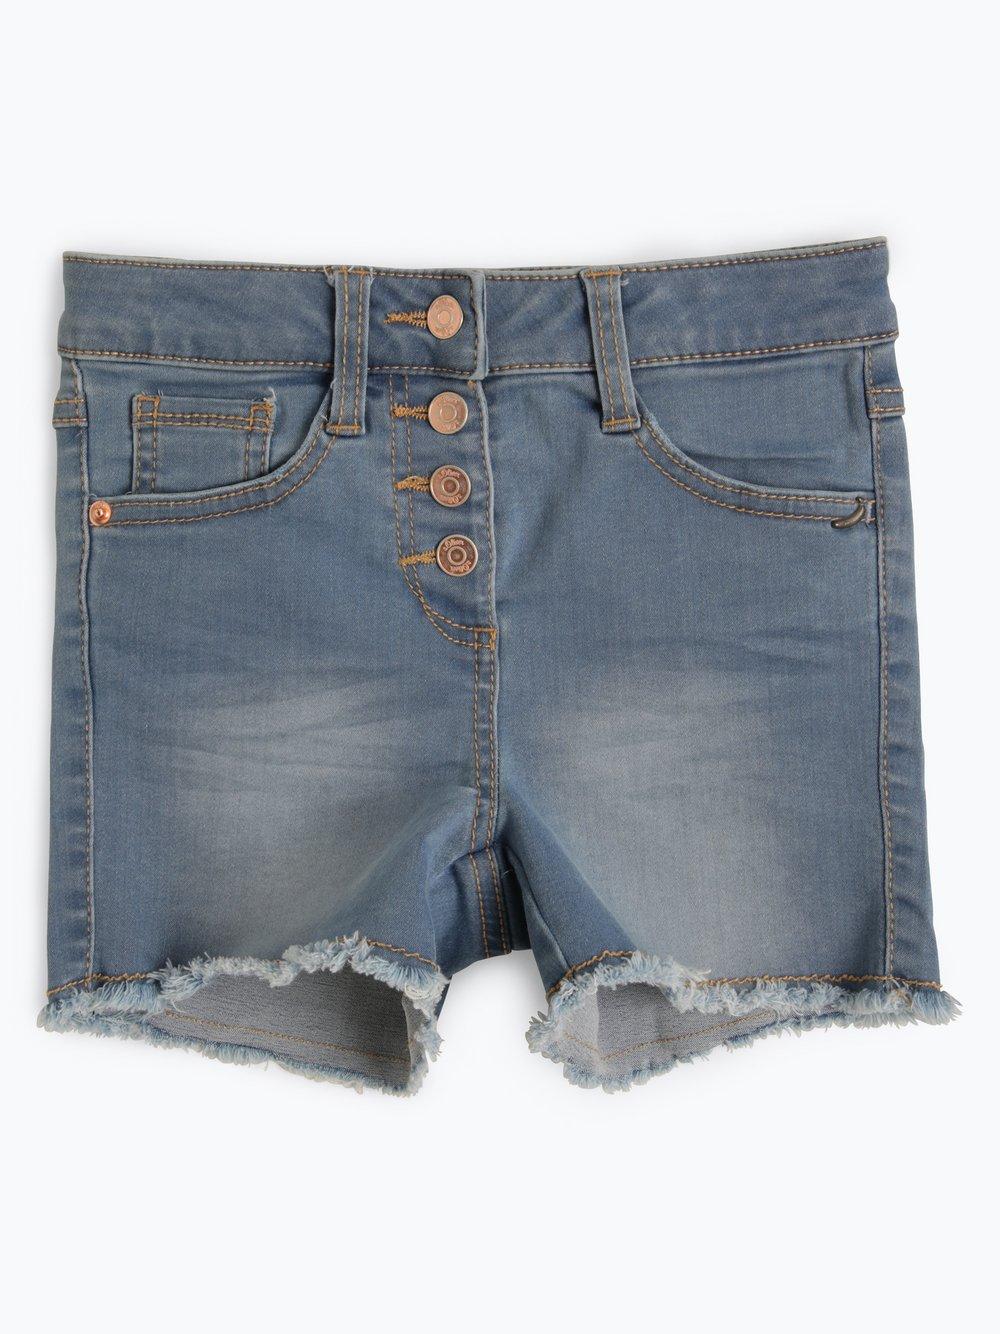 Mädchen Jeansshorts Slim Fit Skinny Suri